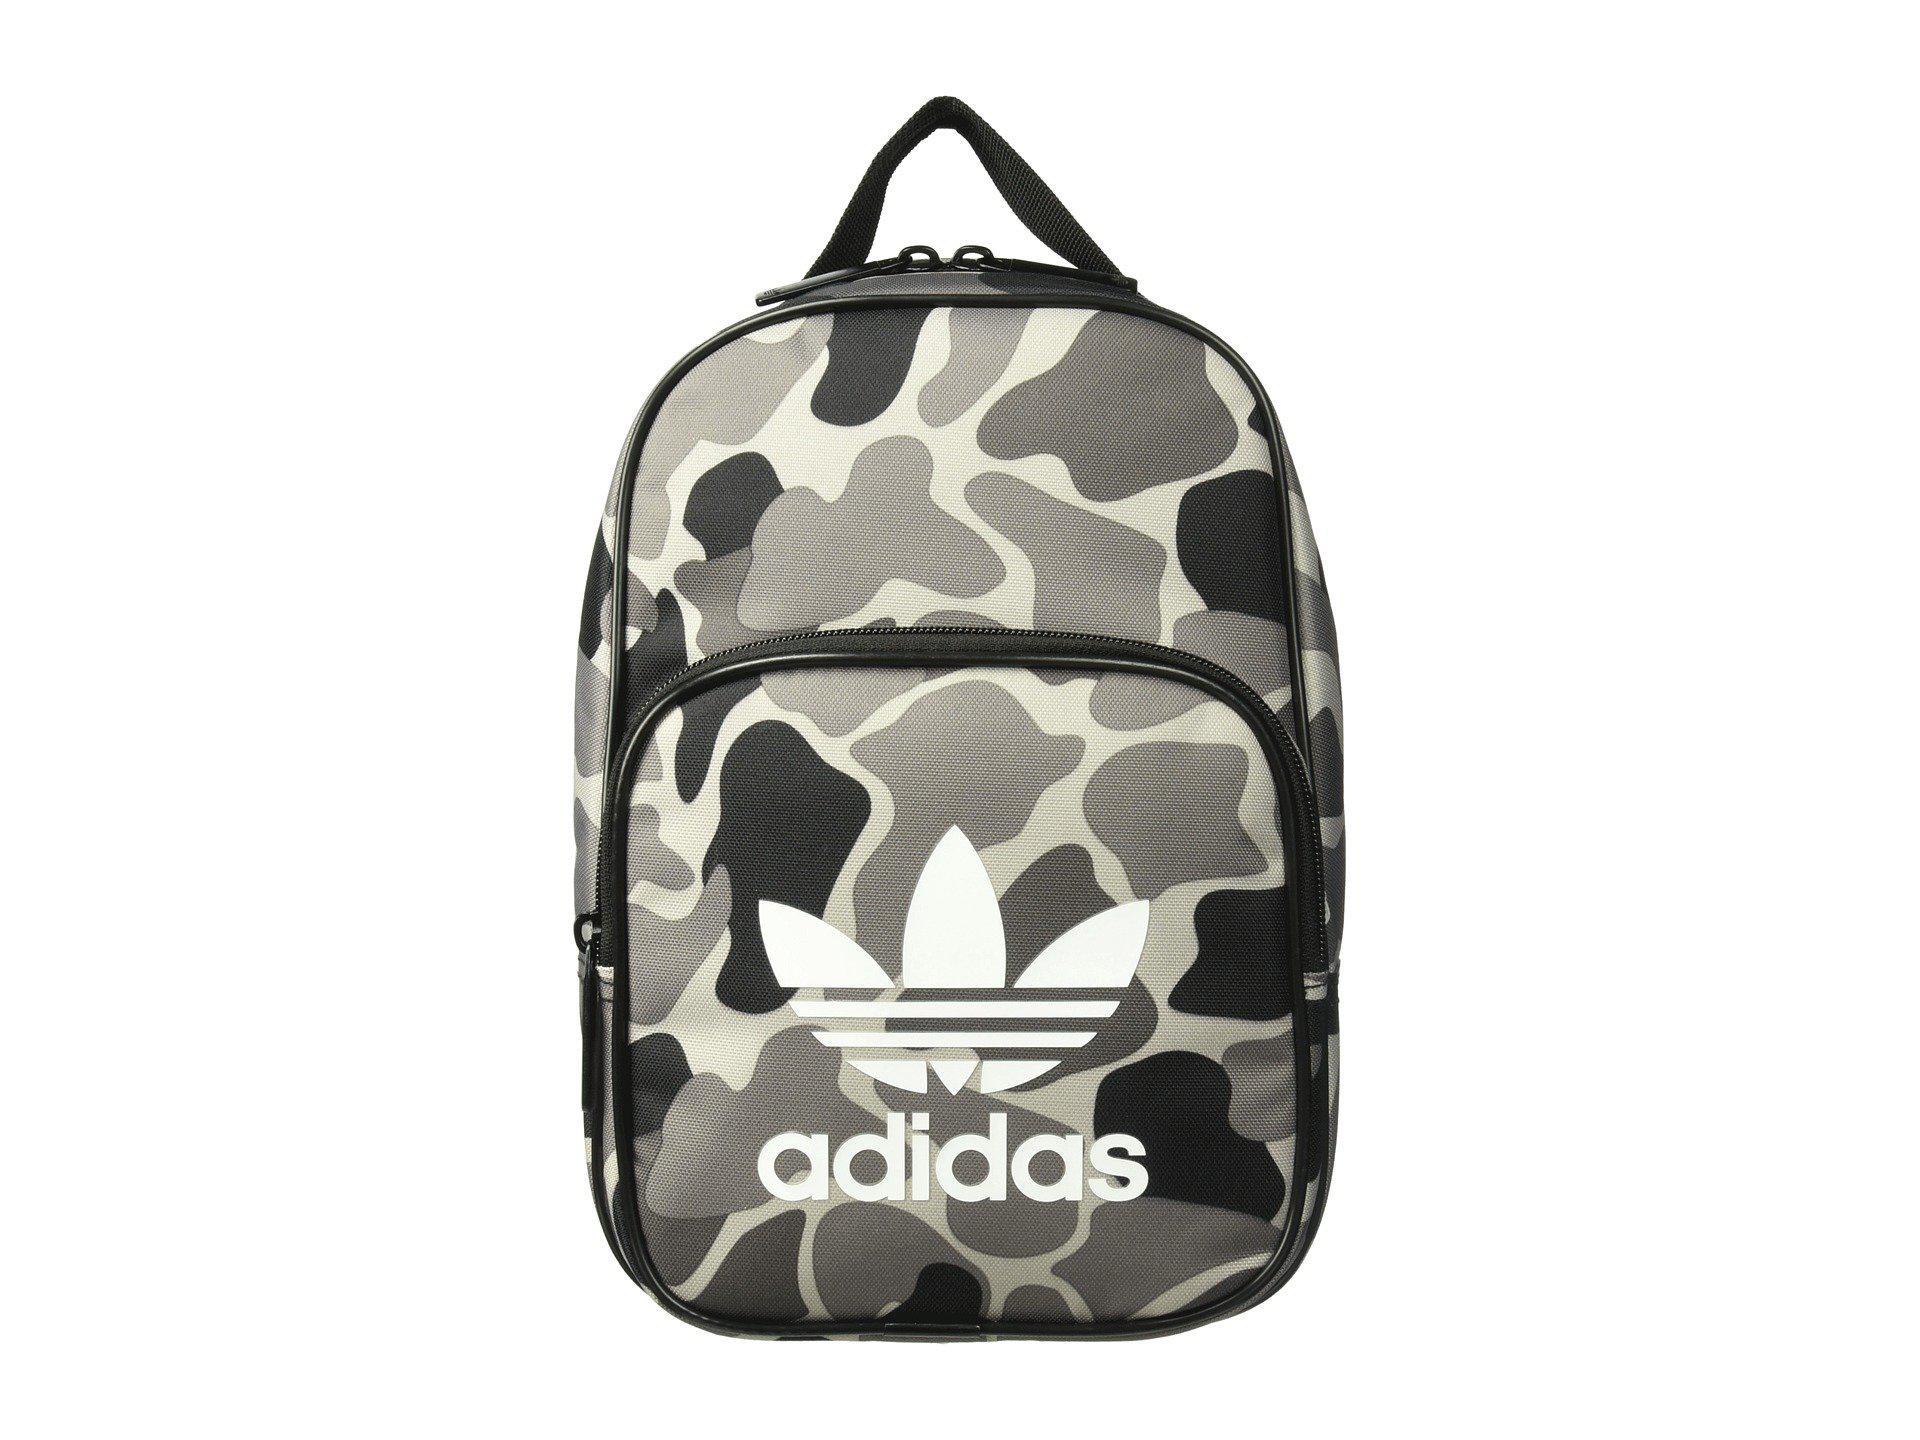 8a115733bc adidas Originals. Women s Originals Santiago Lunch Bag (camo Aop ...